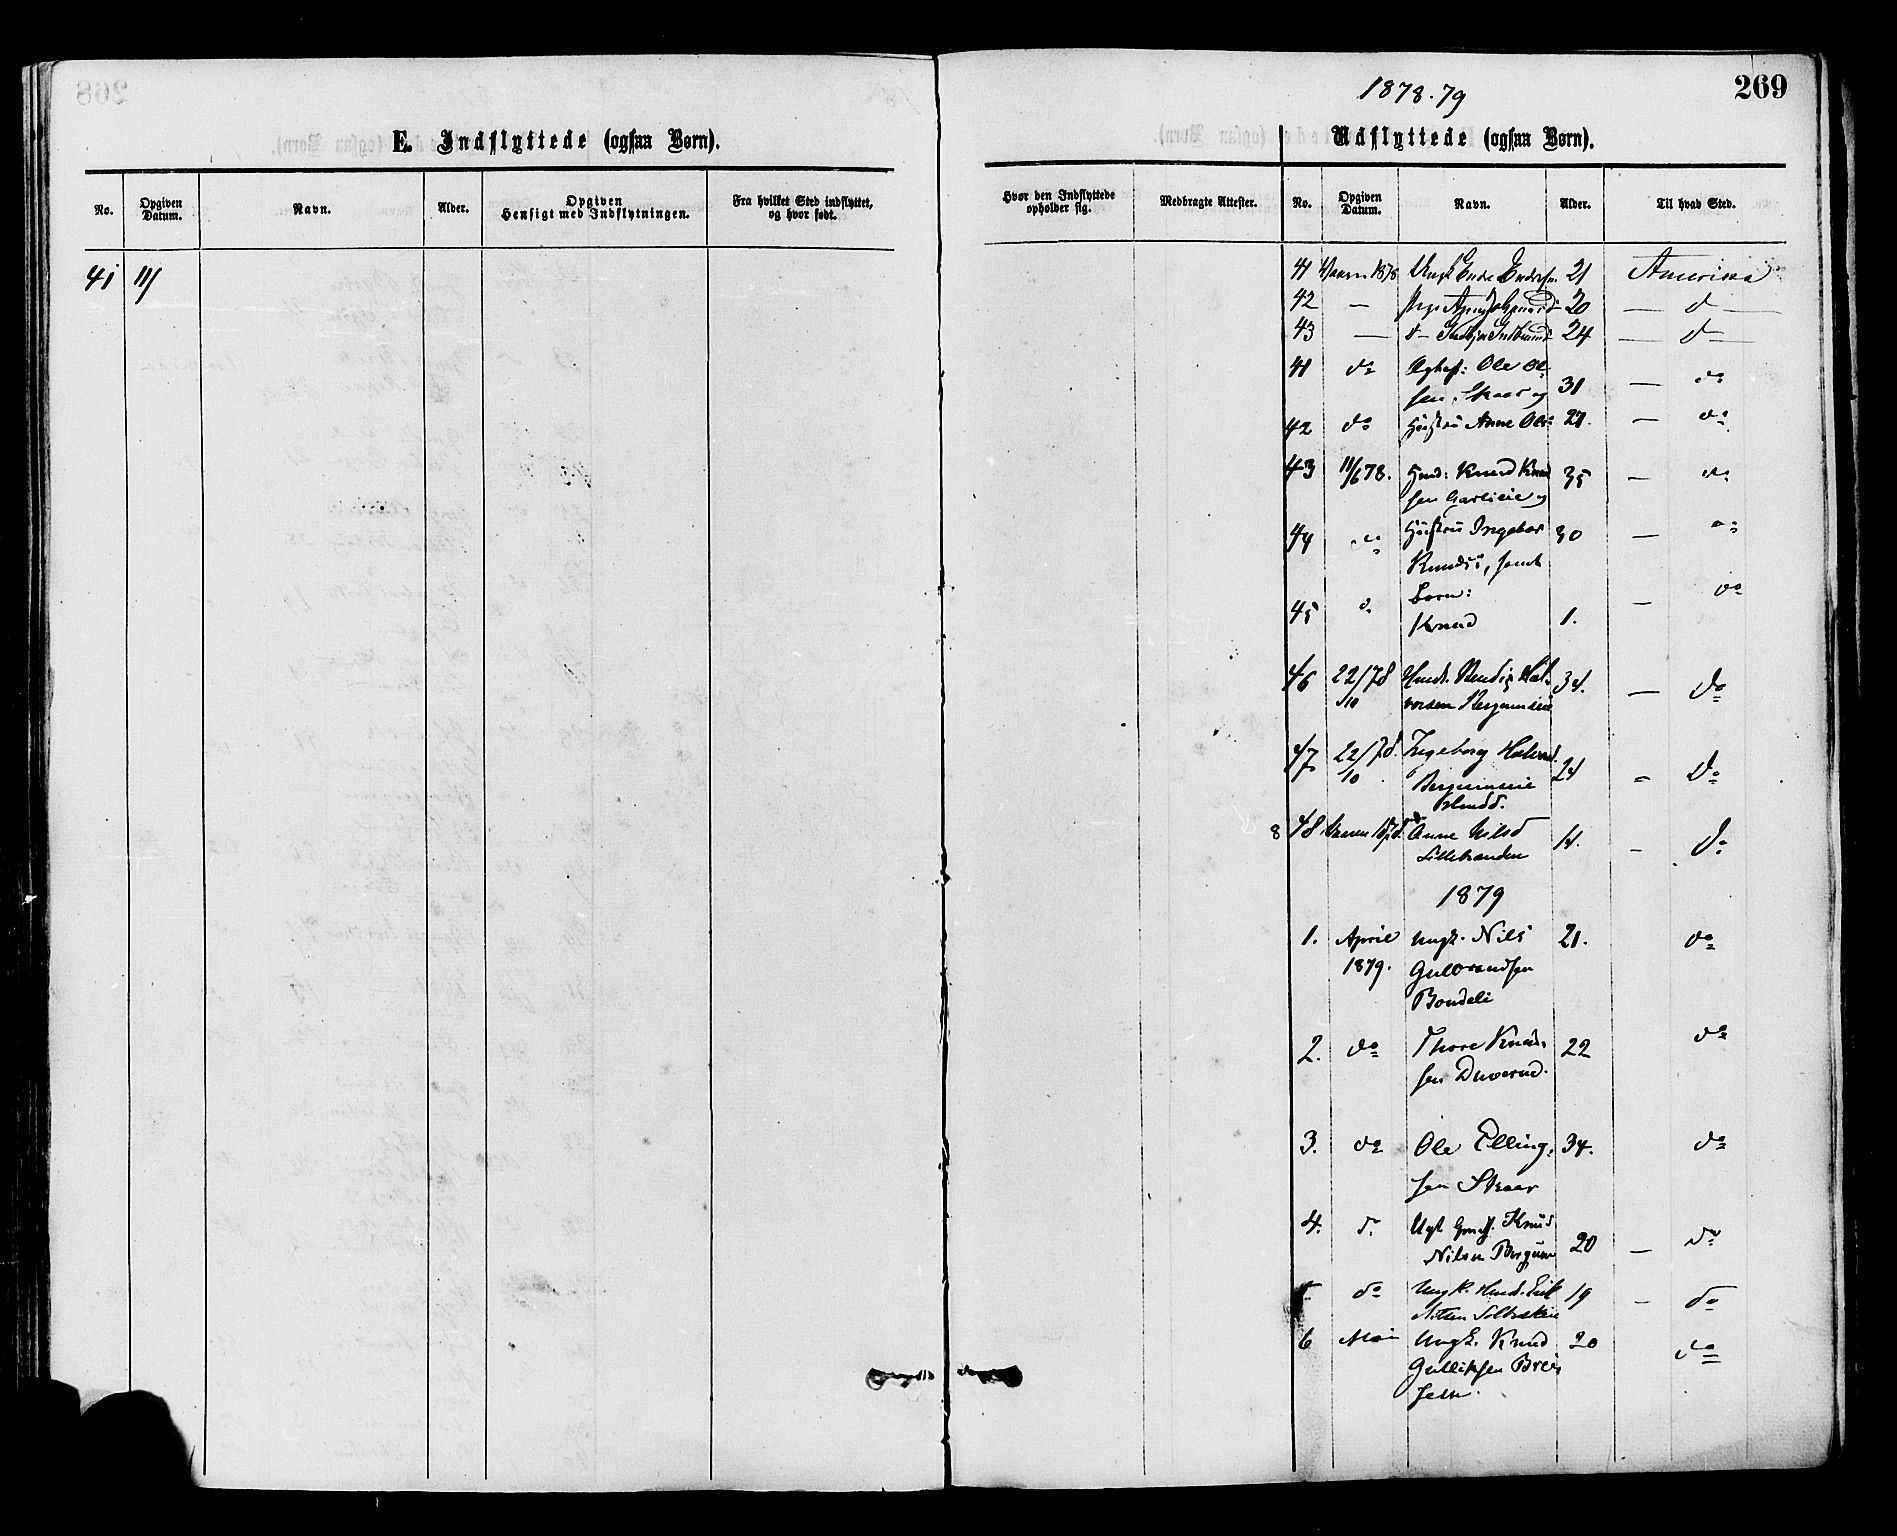 SAH, Nord-Aurdal prestekontor, Ministerialbok nr. 9, 1876-1882, s. 269